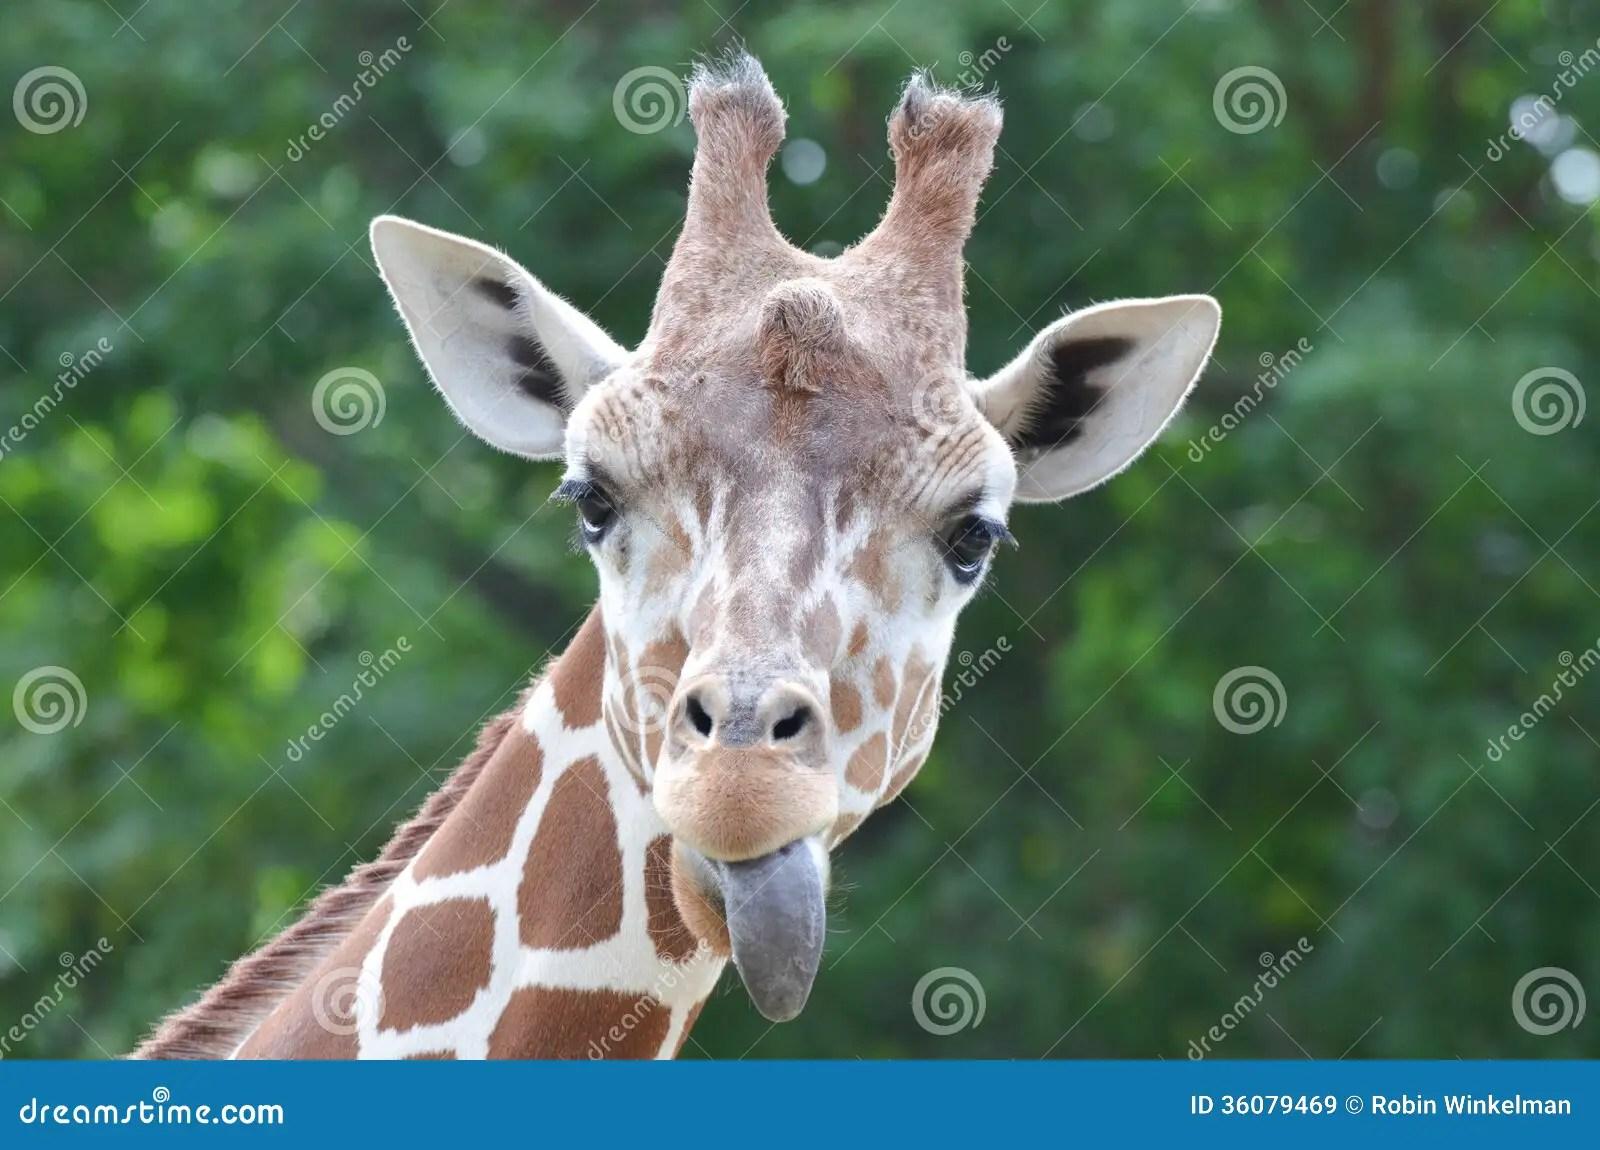 giraffe tongue stock image